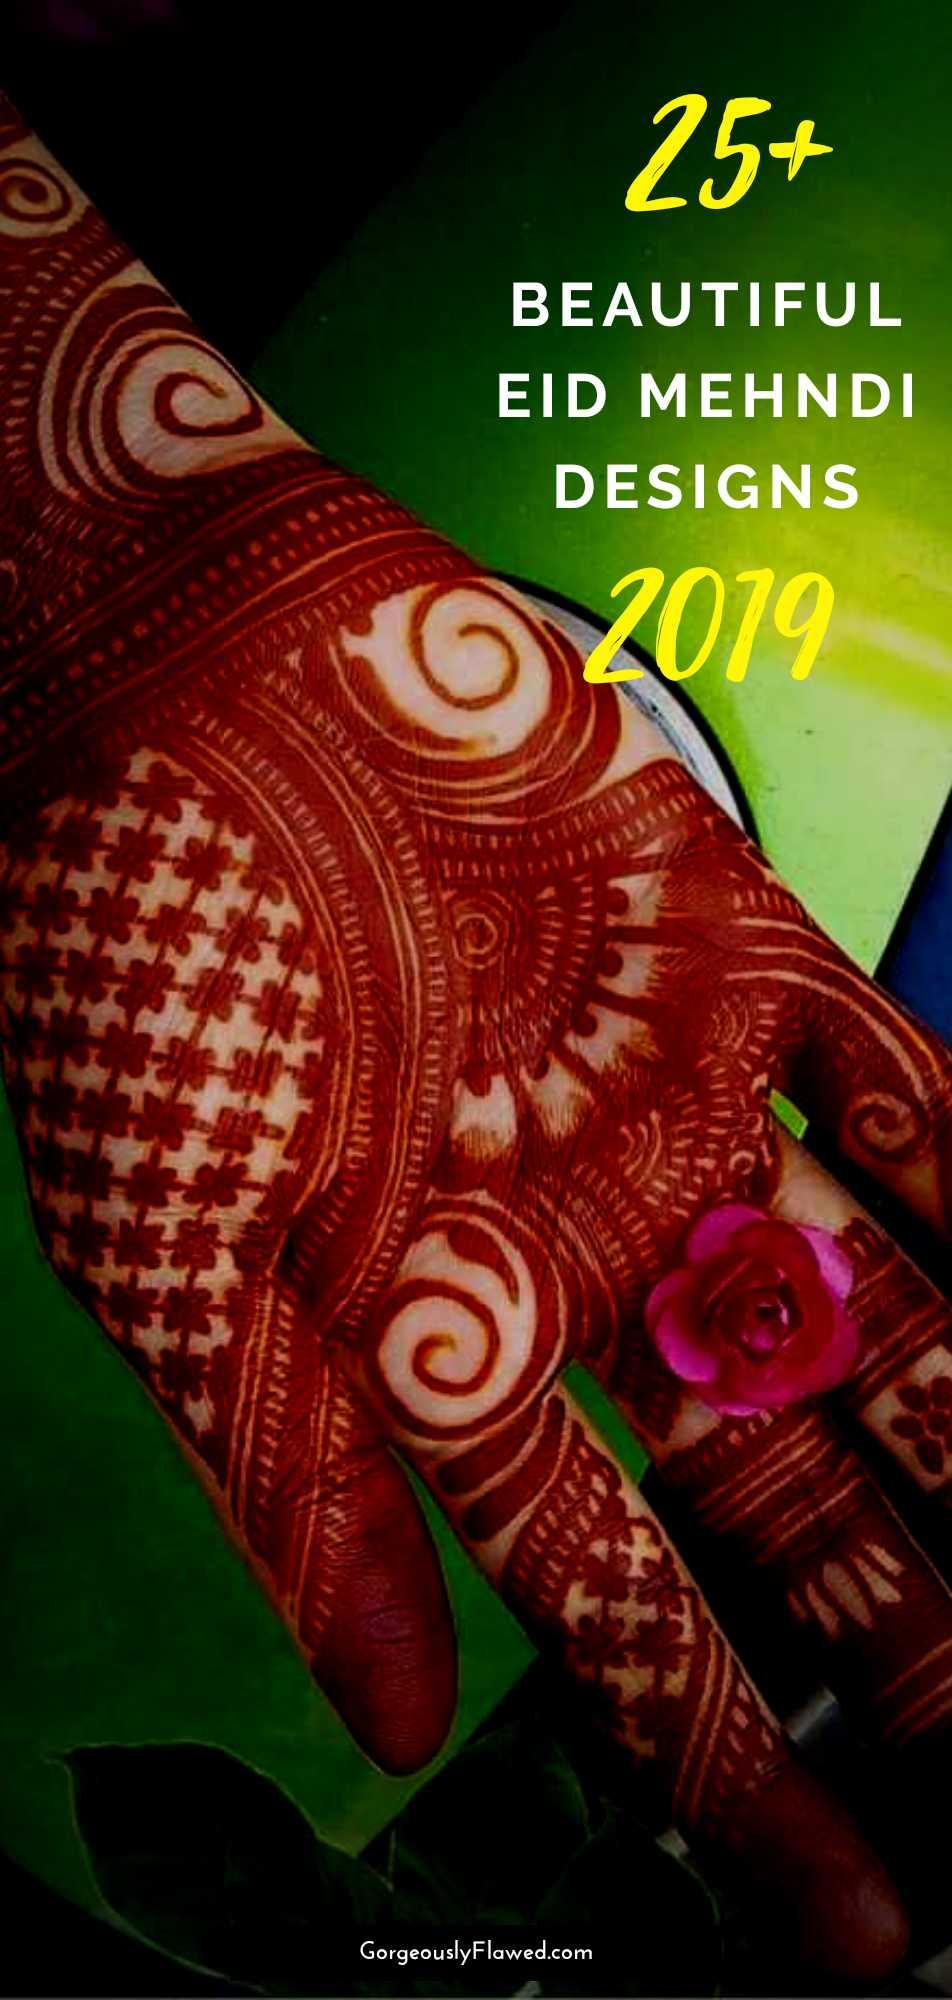 Beautiful Eid Mehndi Designs 2019